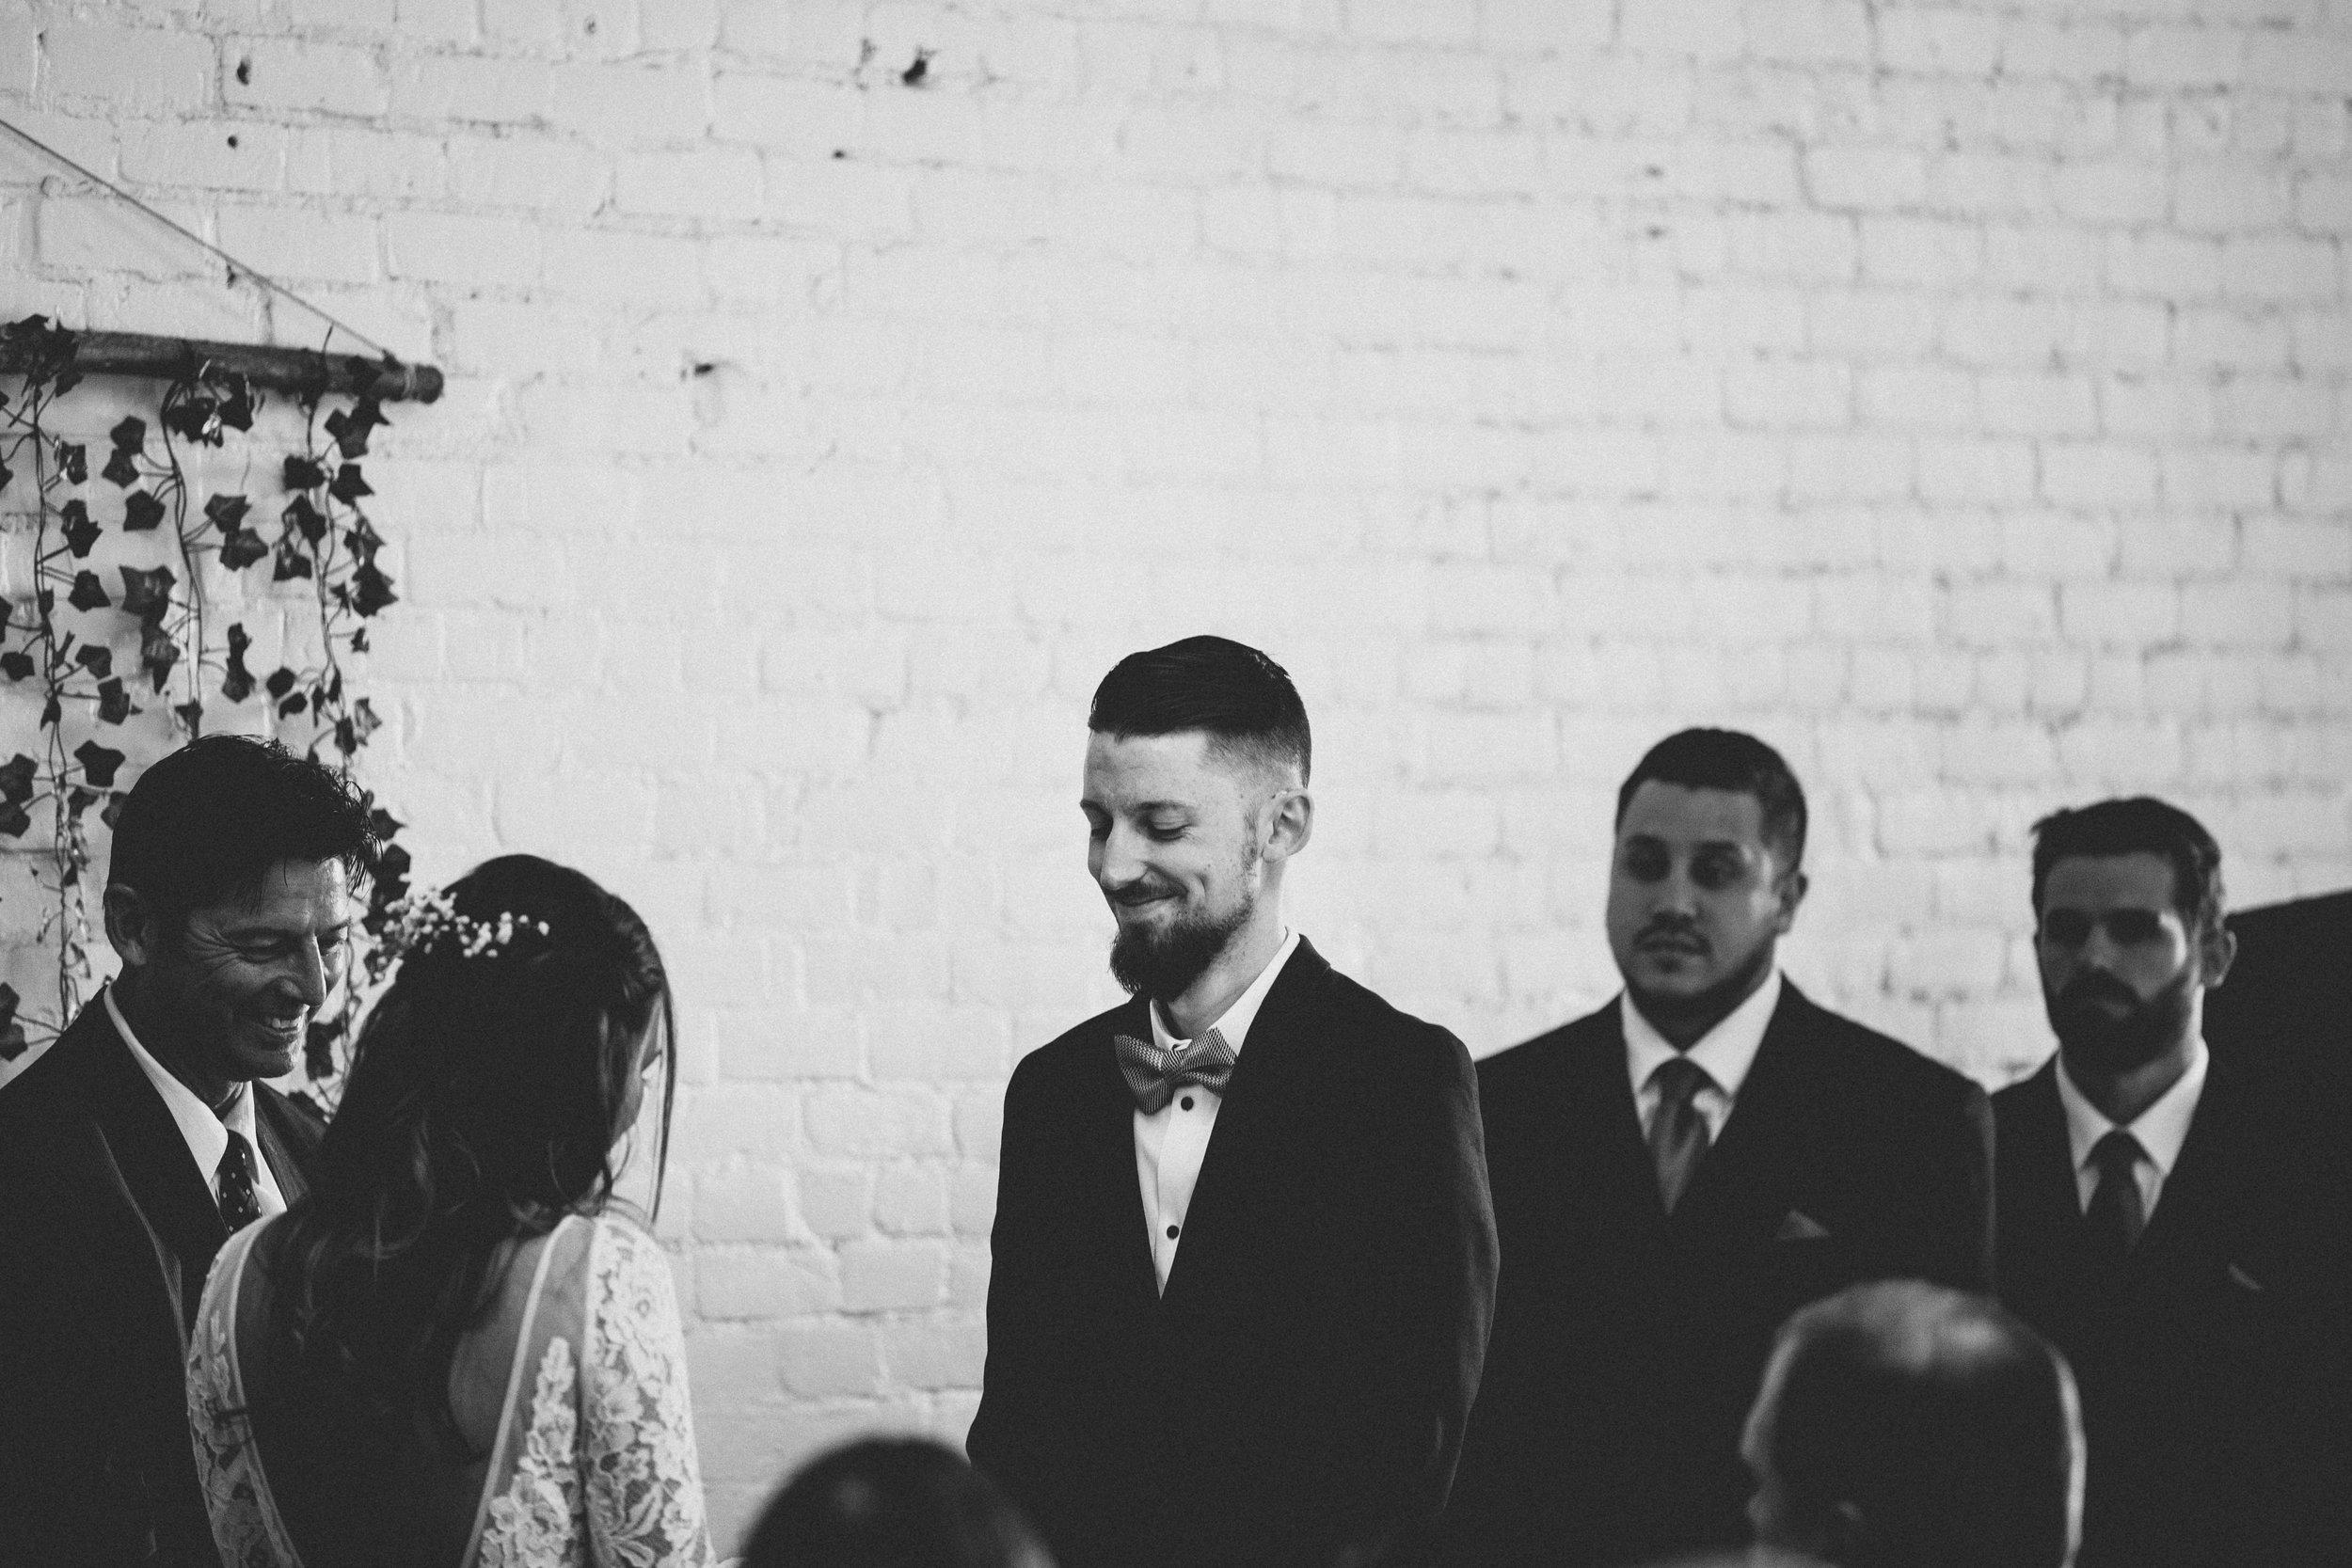 stephanie-hanson-photography-new-york-city-san-antonio-wedding-photographer-stephanie-hanson-photo-new-york-city-wedding-photographer-stephanie-hanson-one-eleven-east-hutto